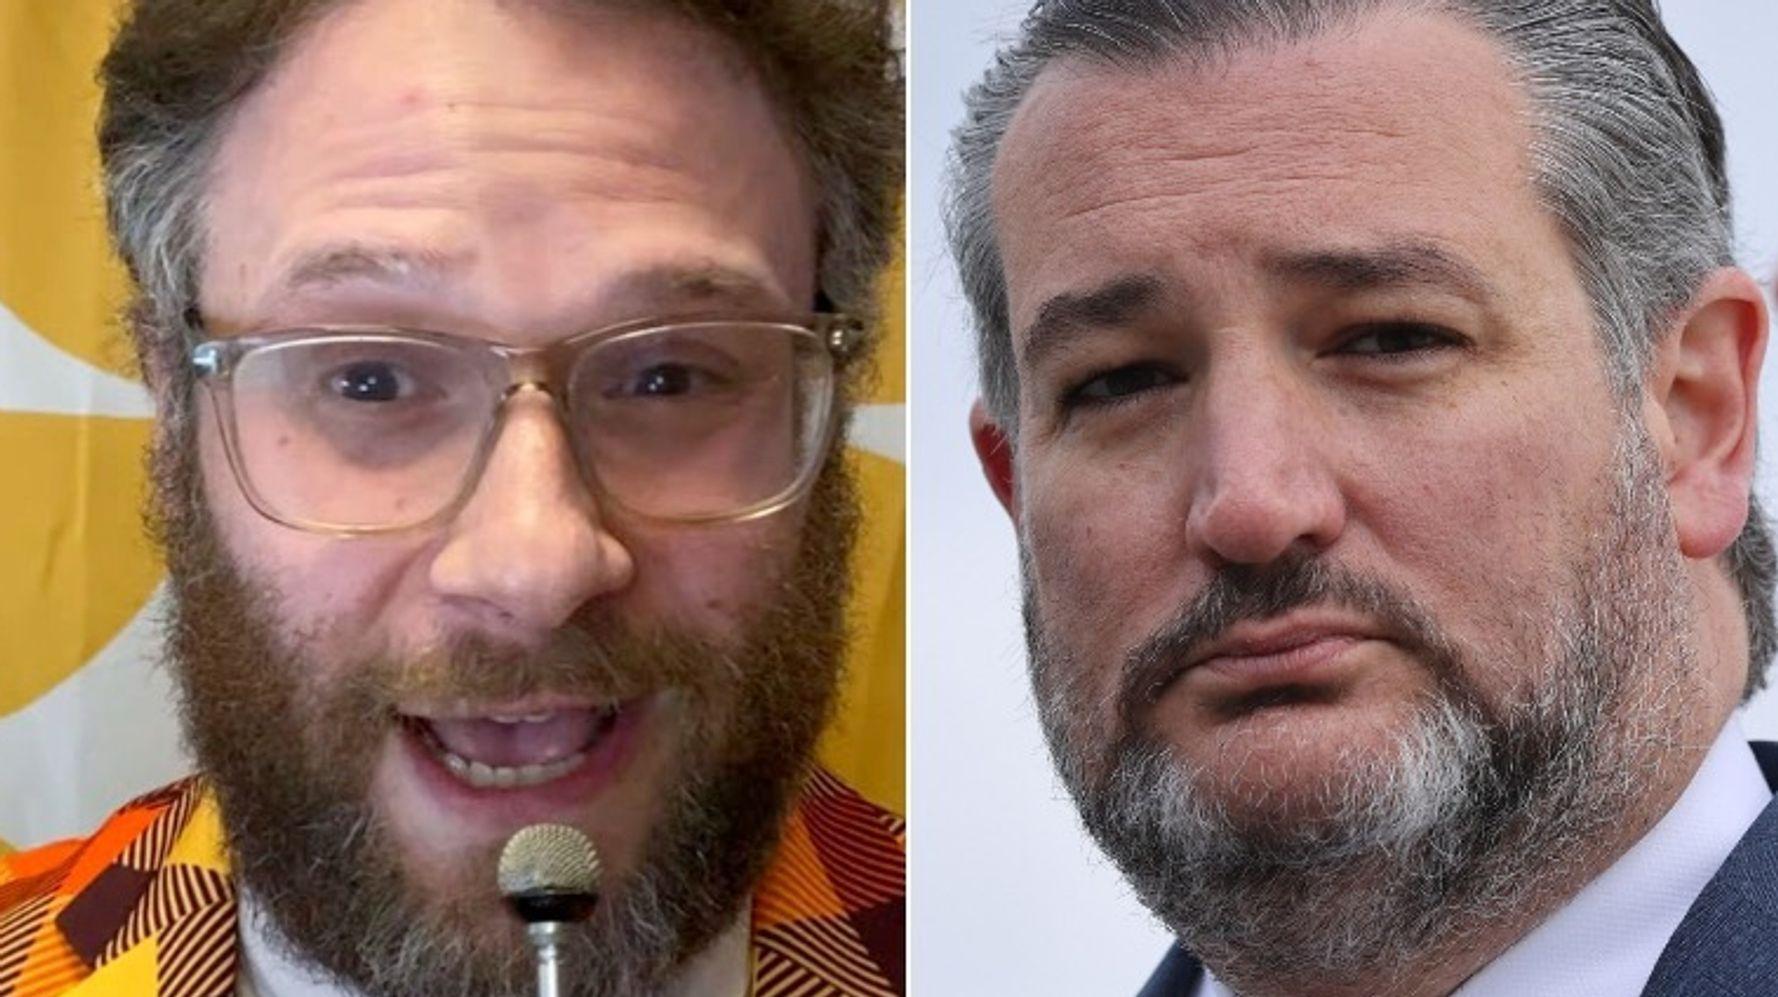 Seth Rogen Torches Ted Cruz: A Fascist Whose 'Words Caused People To Die'